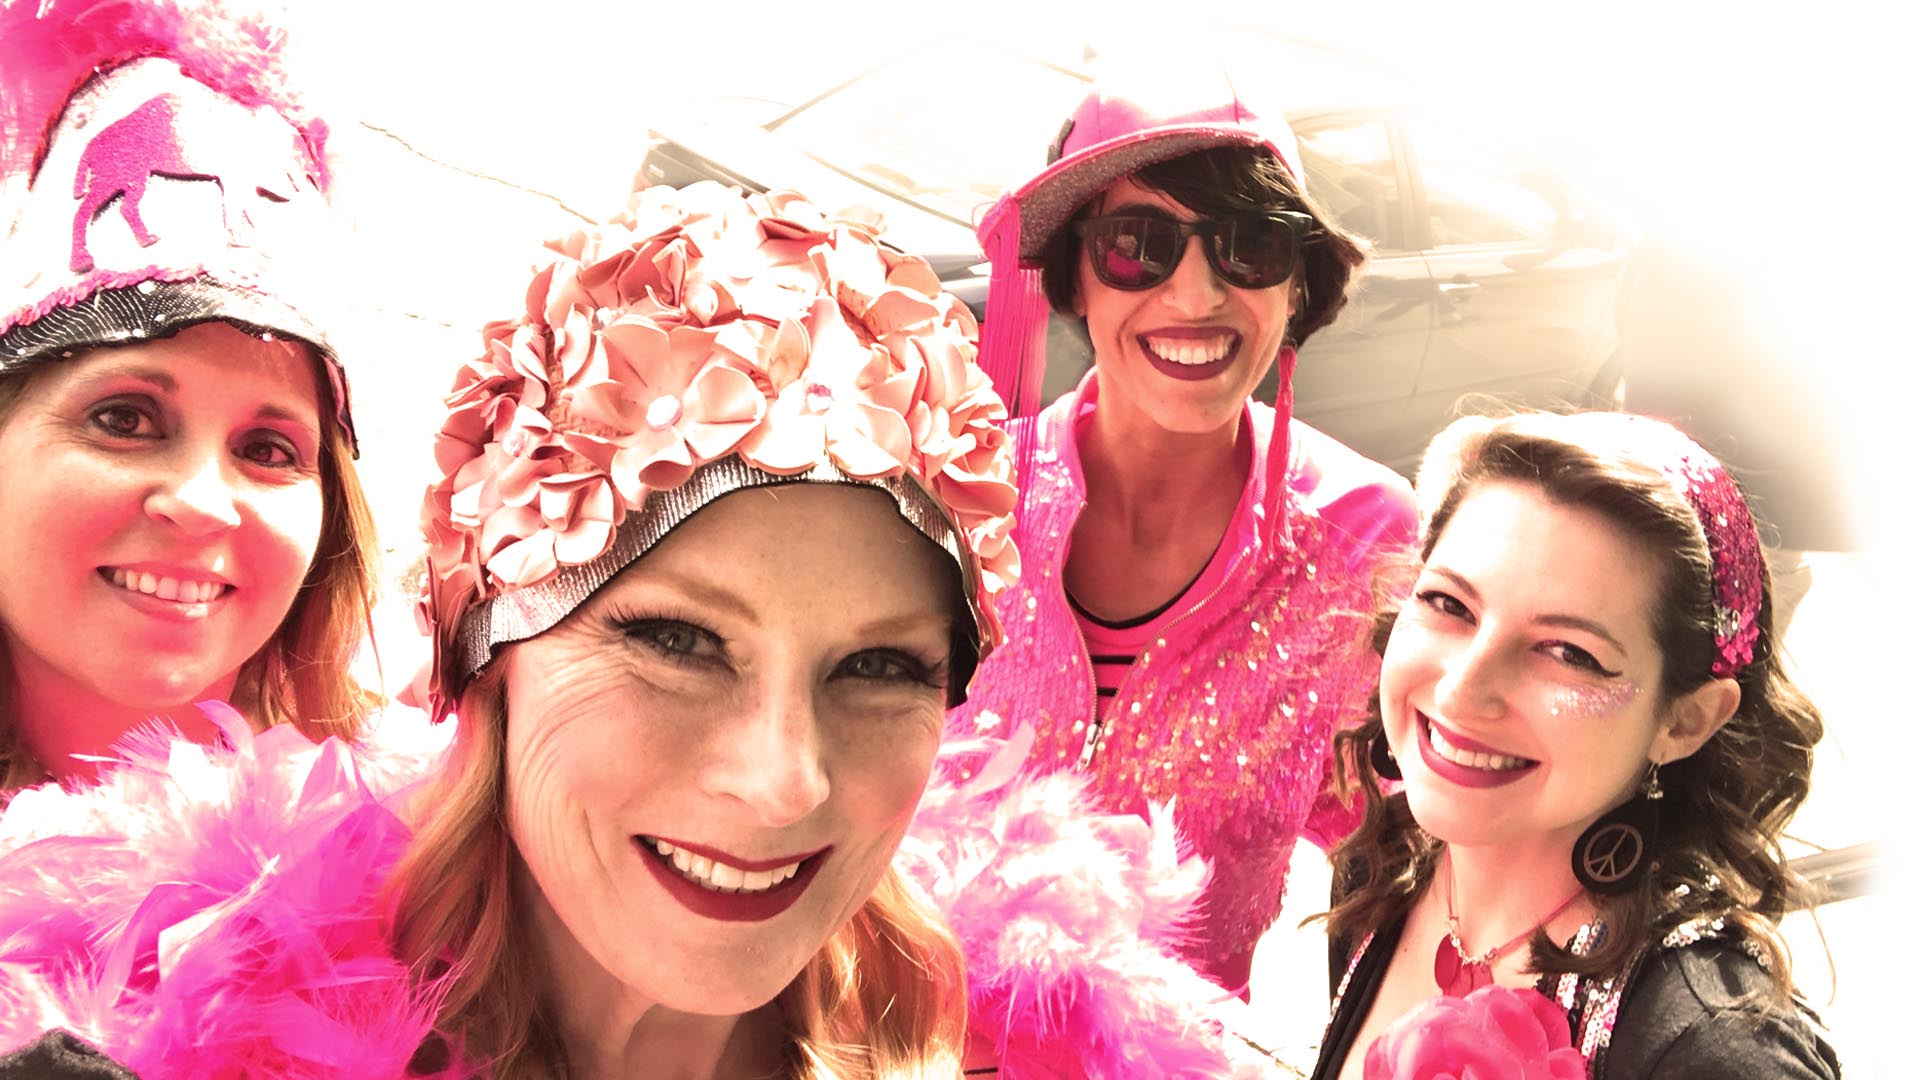 Mardi Gras Costume Katy Beh Jewelry New Orleans